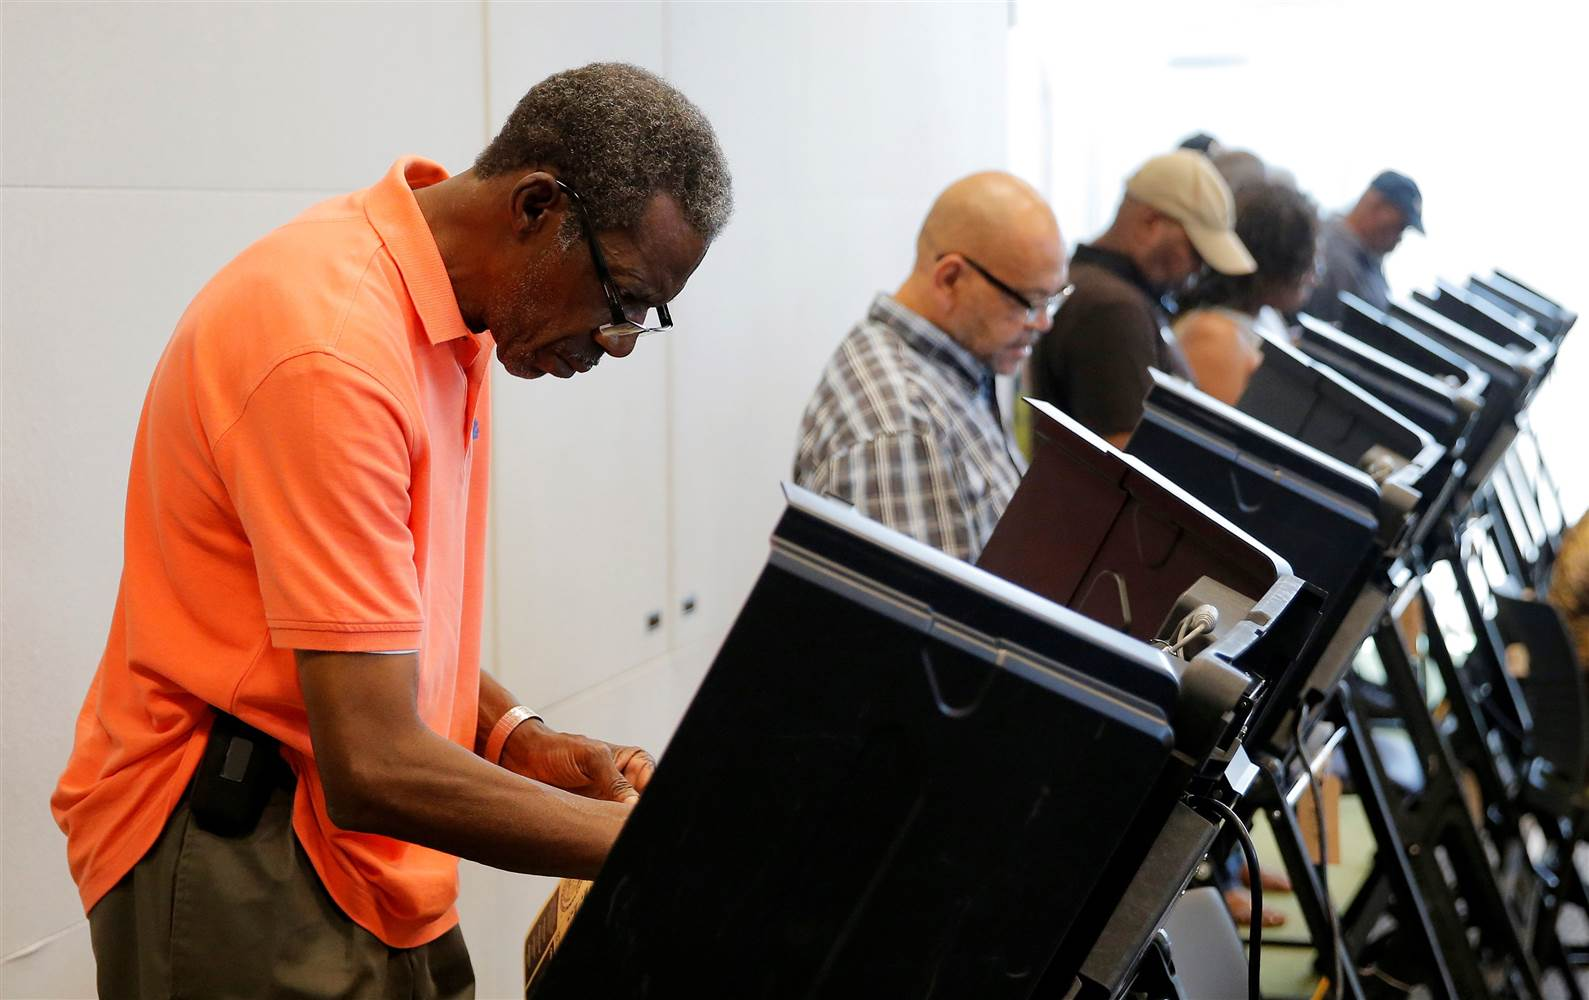 _1154096619_s1beuictsqaa_rtrmadp_3_usa-election-northcarolina-early-voting_b64d927d9ca9f2c331c7a275514bfd8a.nbcnews-ux-2880-1000